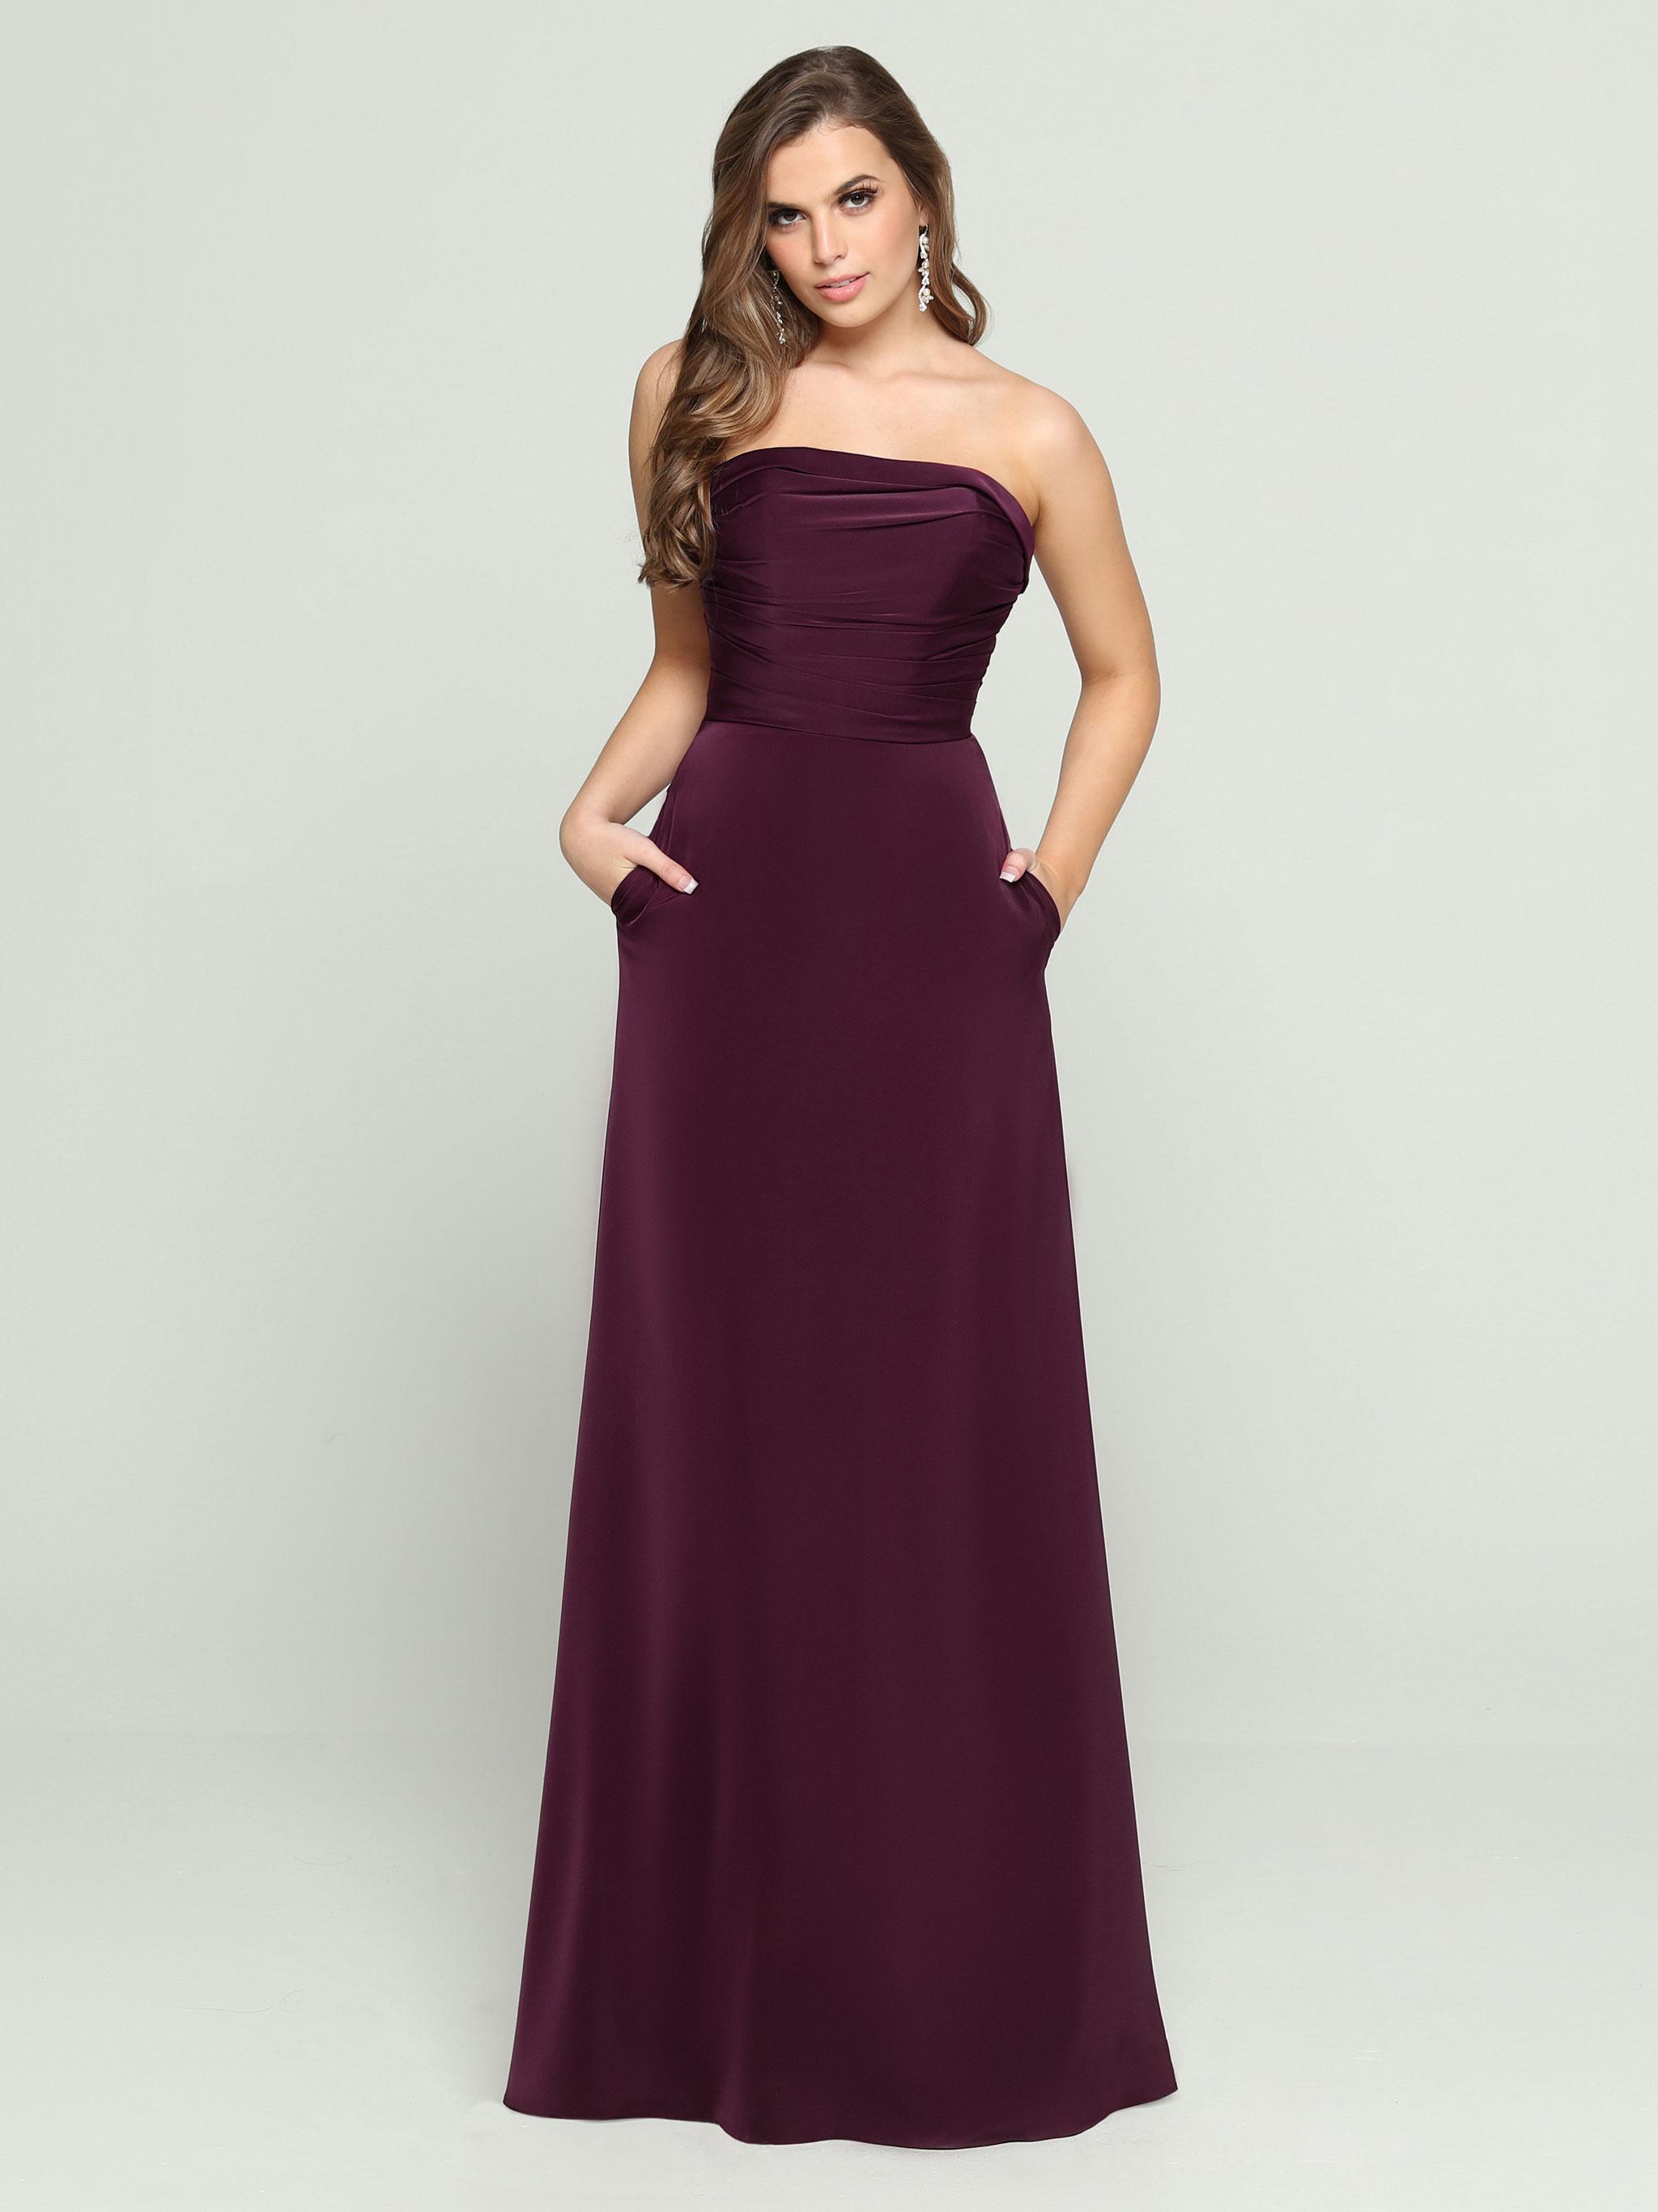 Style #60467